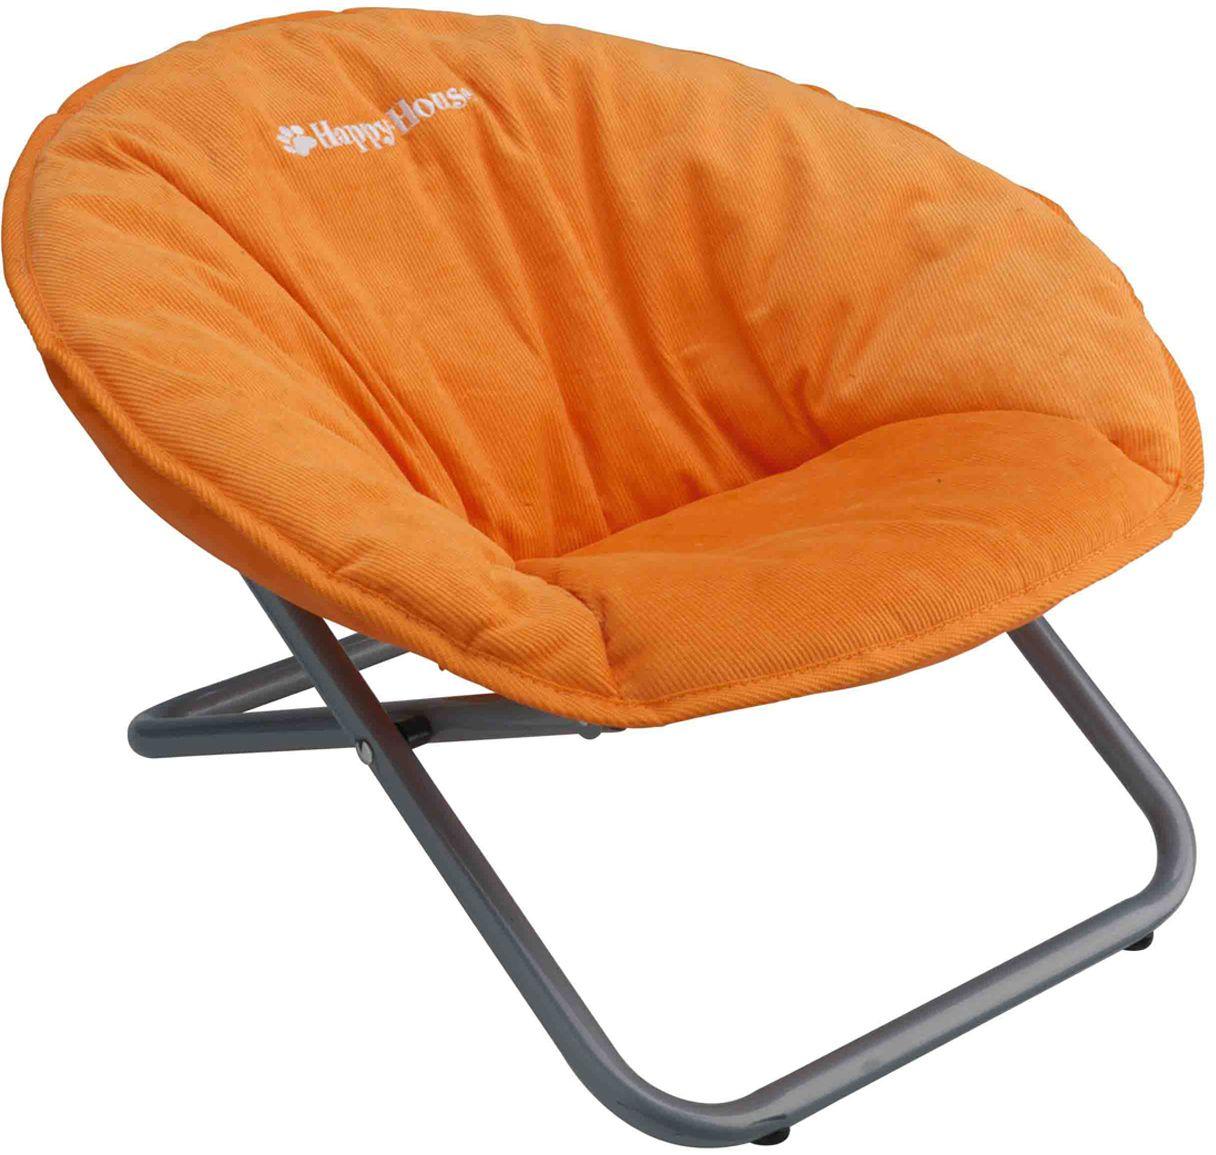 Стул для домашник животных Happy House New Classic, цвет: оранжевый, 55х51х36 см, до 15 кг8305-3